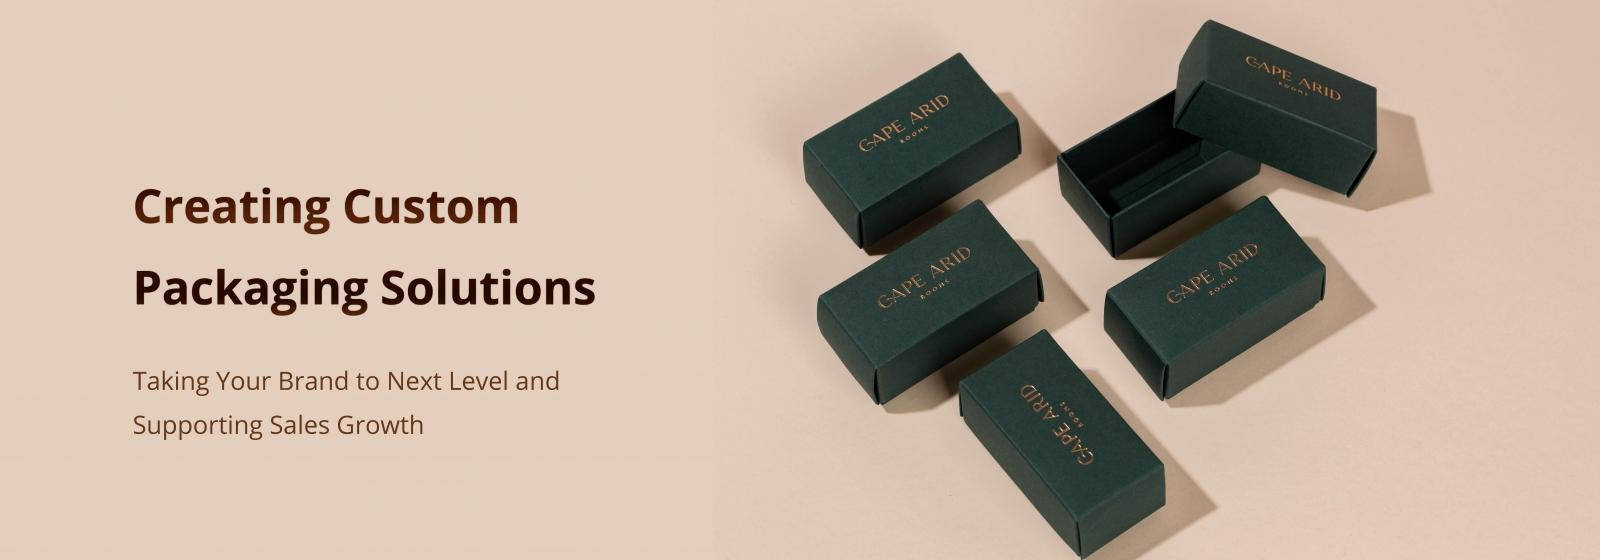 Custom solutions banner